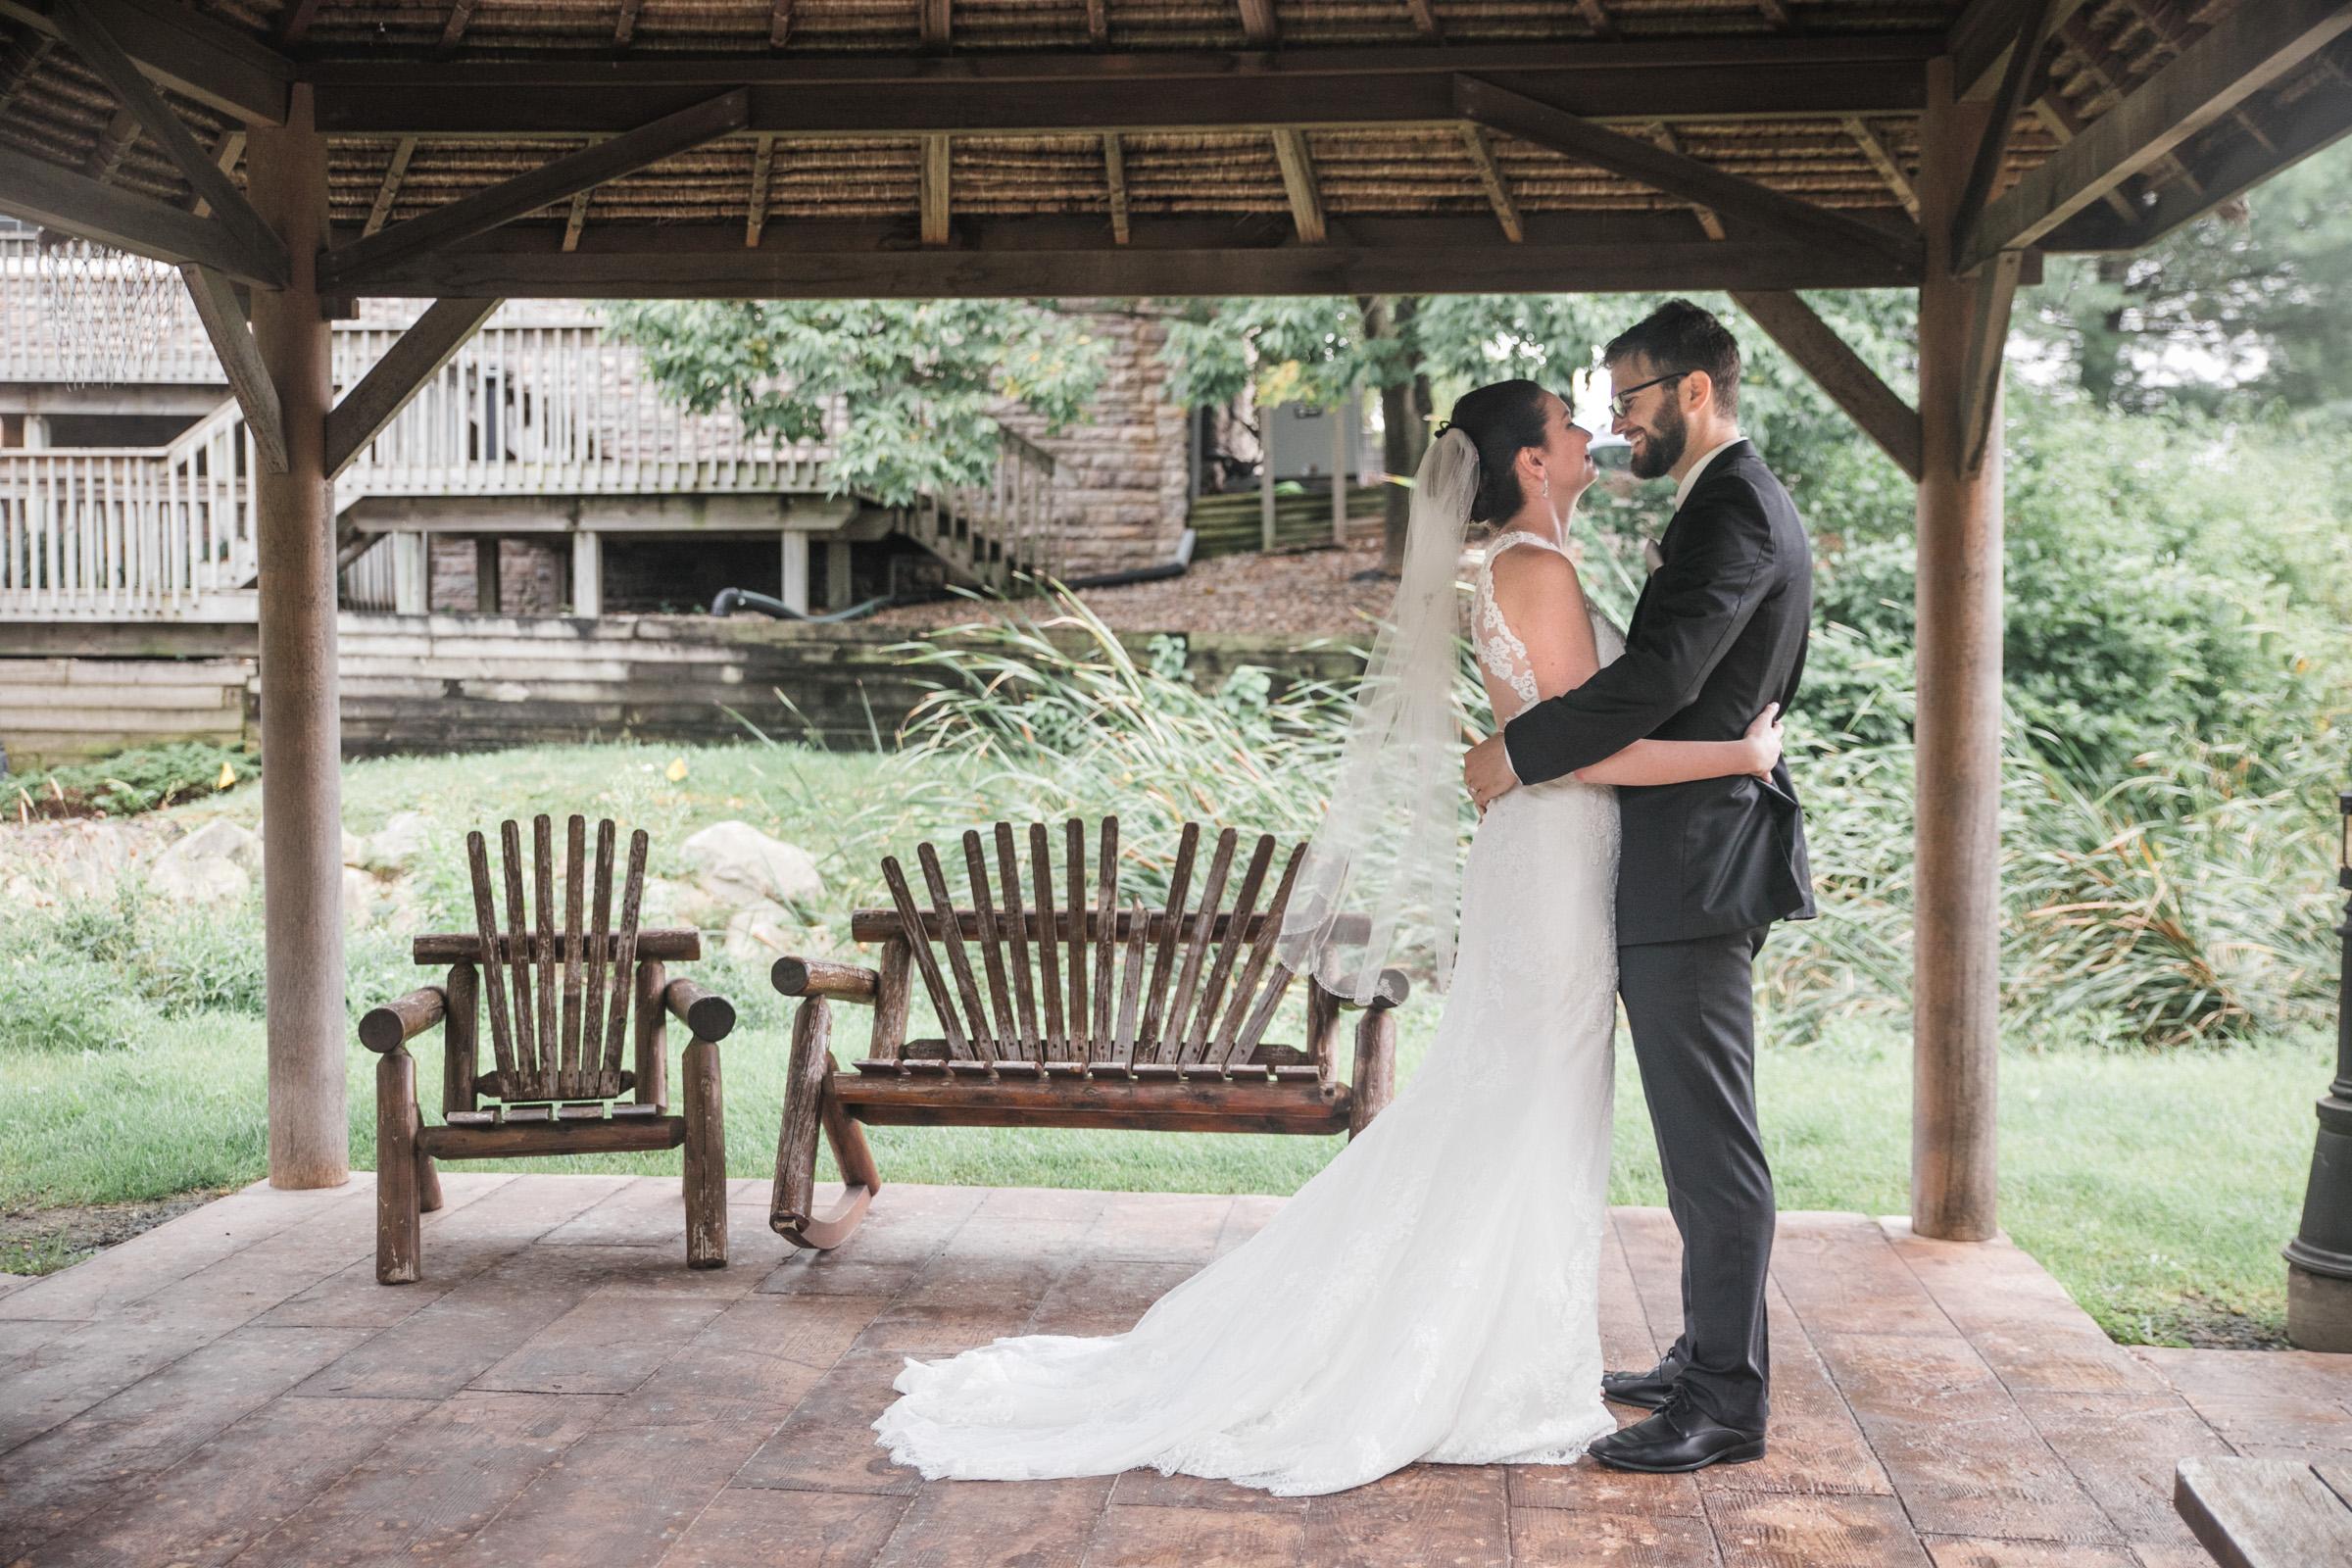 johnston_iowa_wedding_photographers-9.jpg